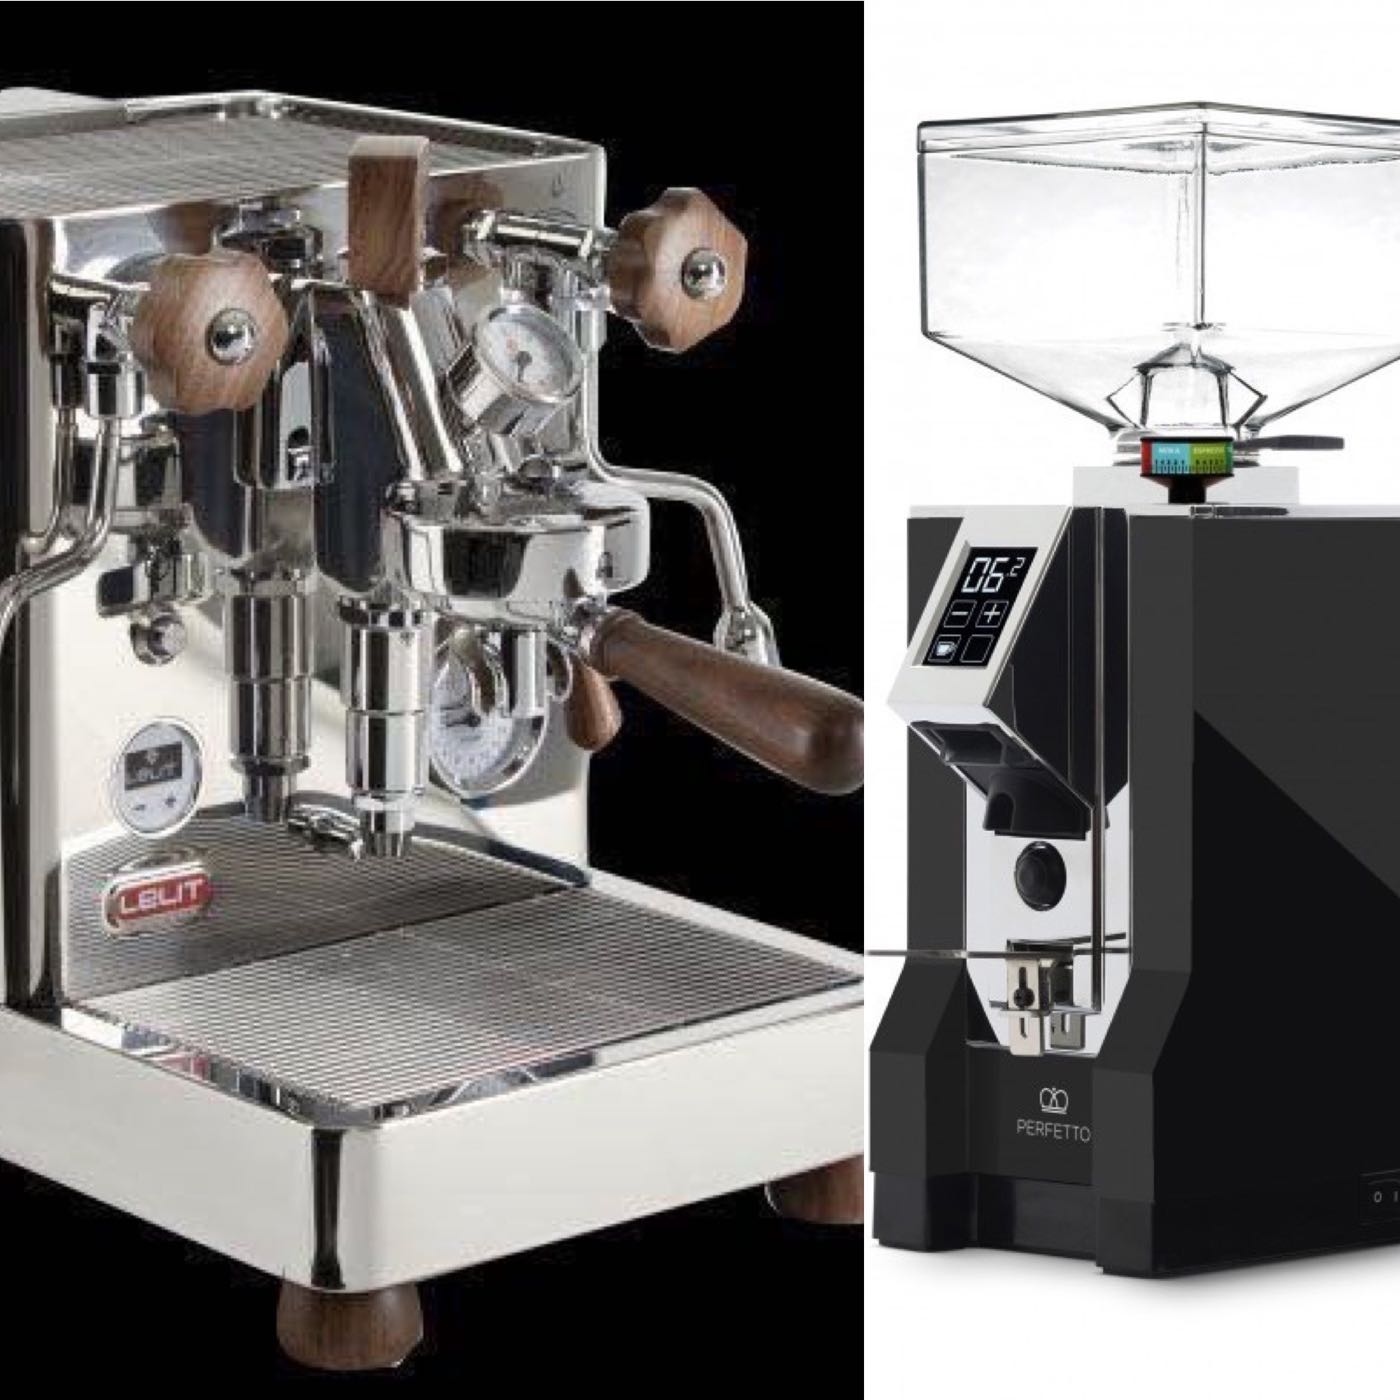 🇮🇹LELIT PL162T義式咖啡機+🇮🇹Eureka Mignon Specialita 110V 義式專用專業定時磨豆機 觸控/靜音 優惠組合